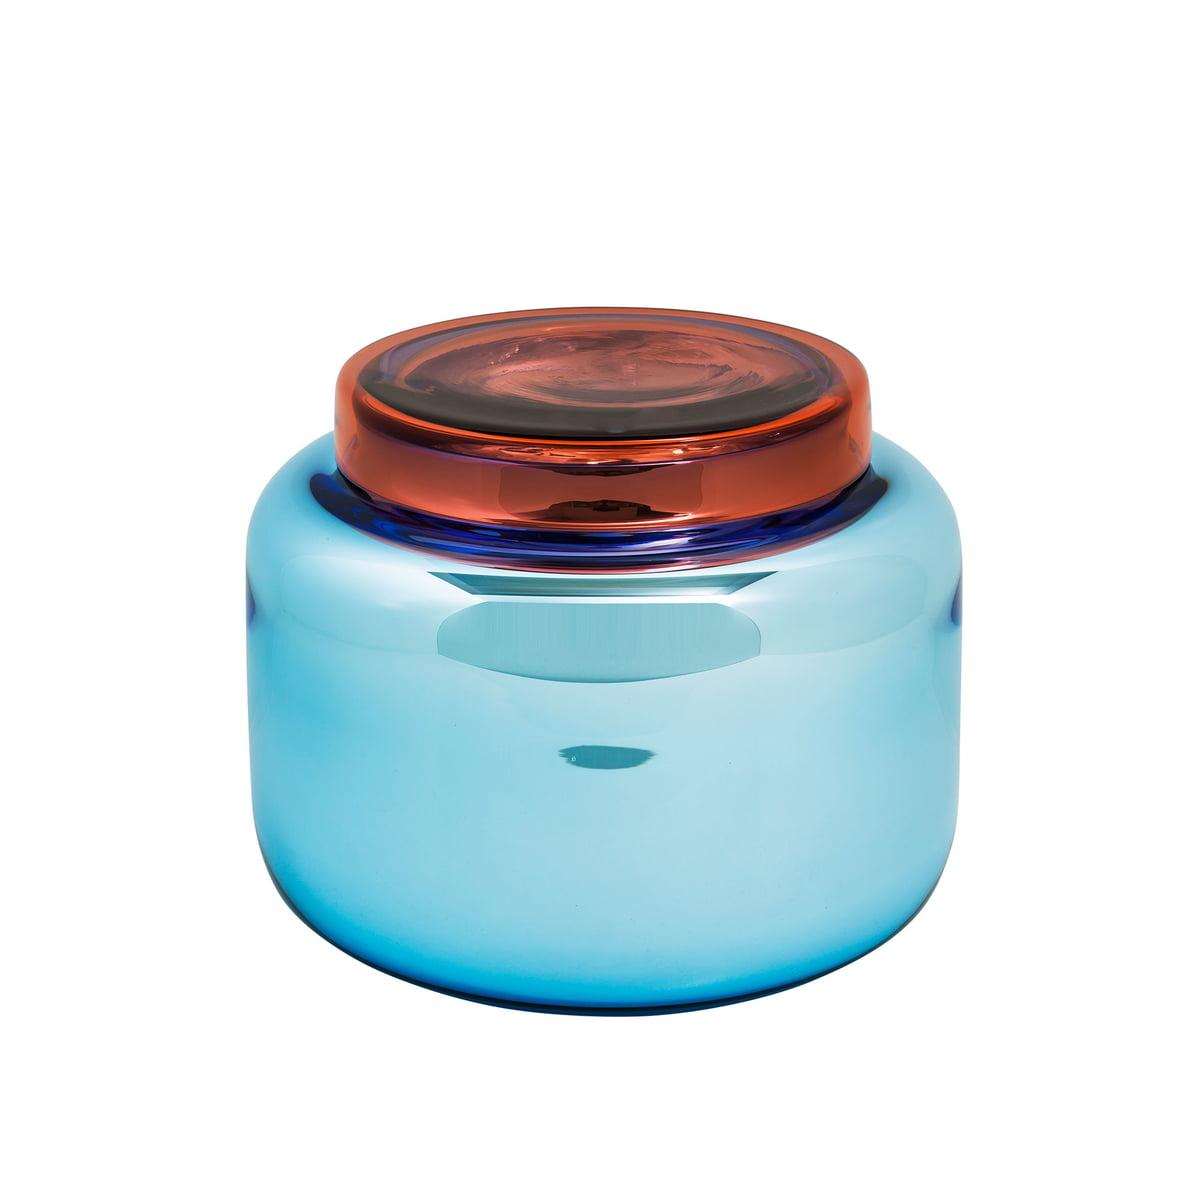 Pulpo - Low Container, blau versilbert / Deckel rot | Büro > Büroschränke > Container | Pulpo